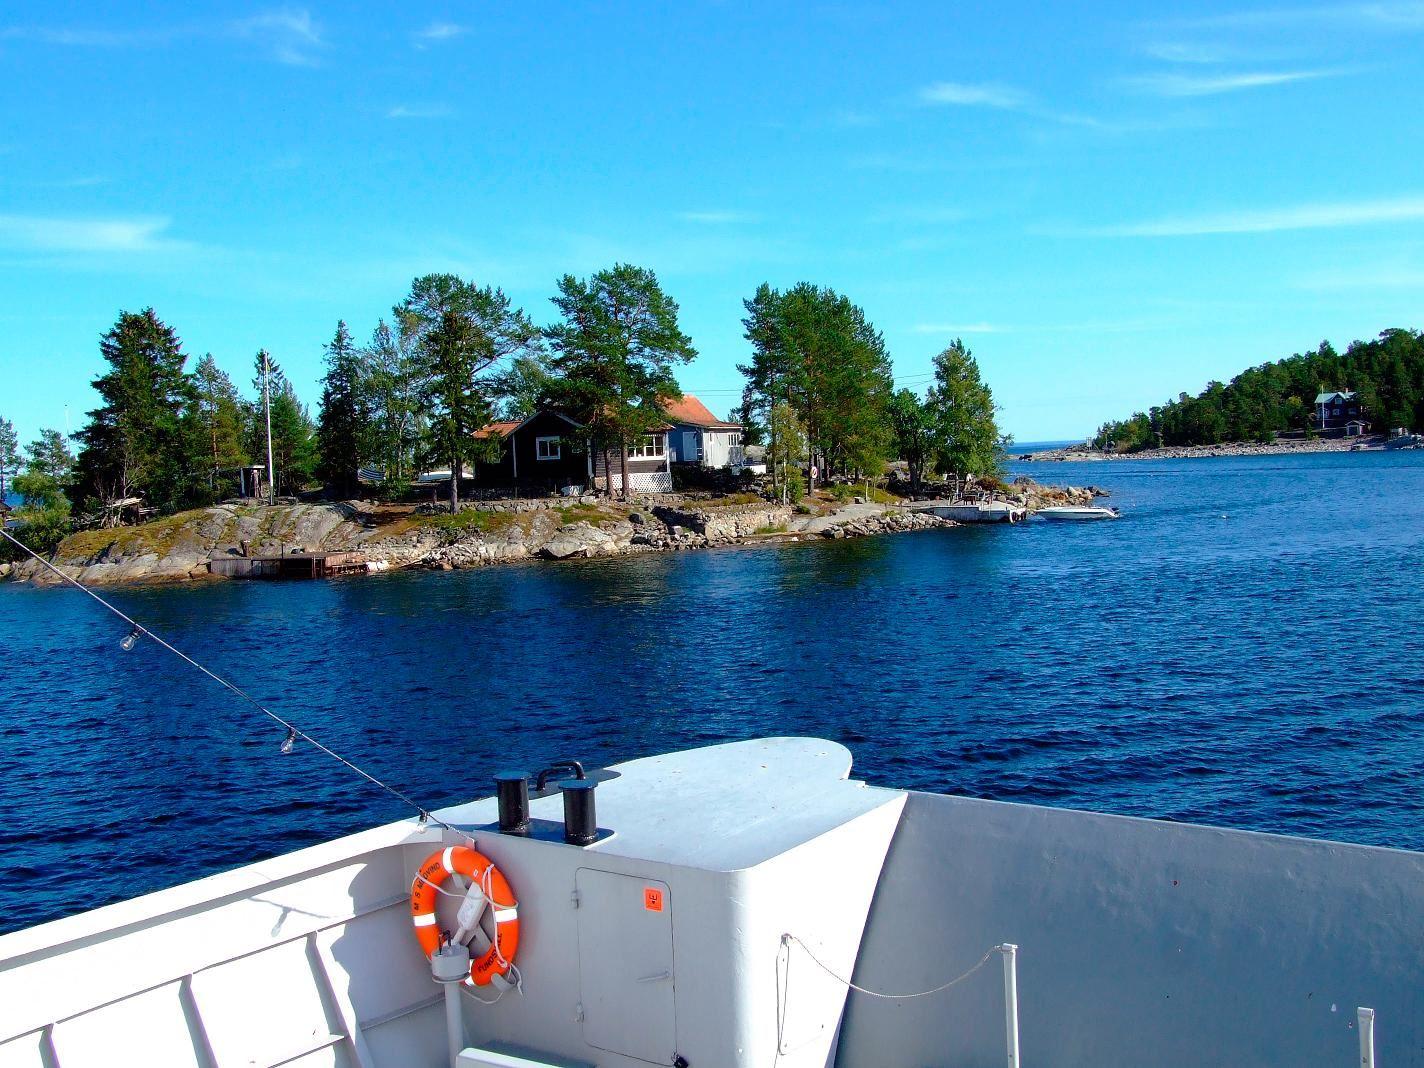 Archipelago Cruise M / S Medvind